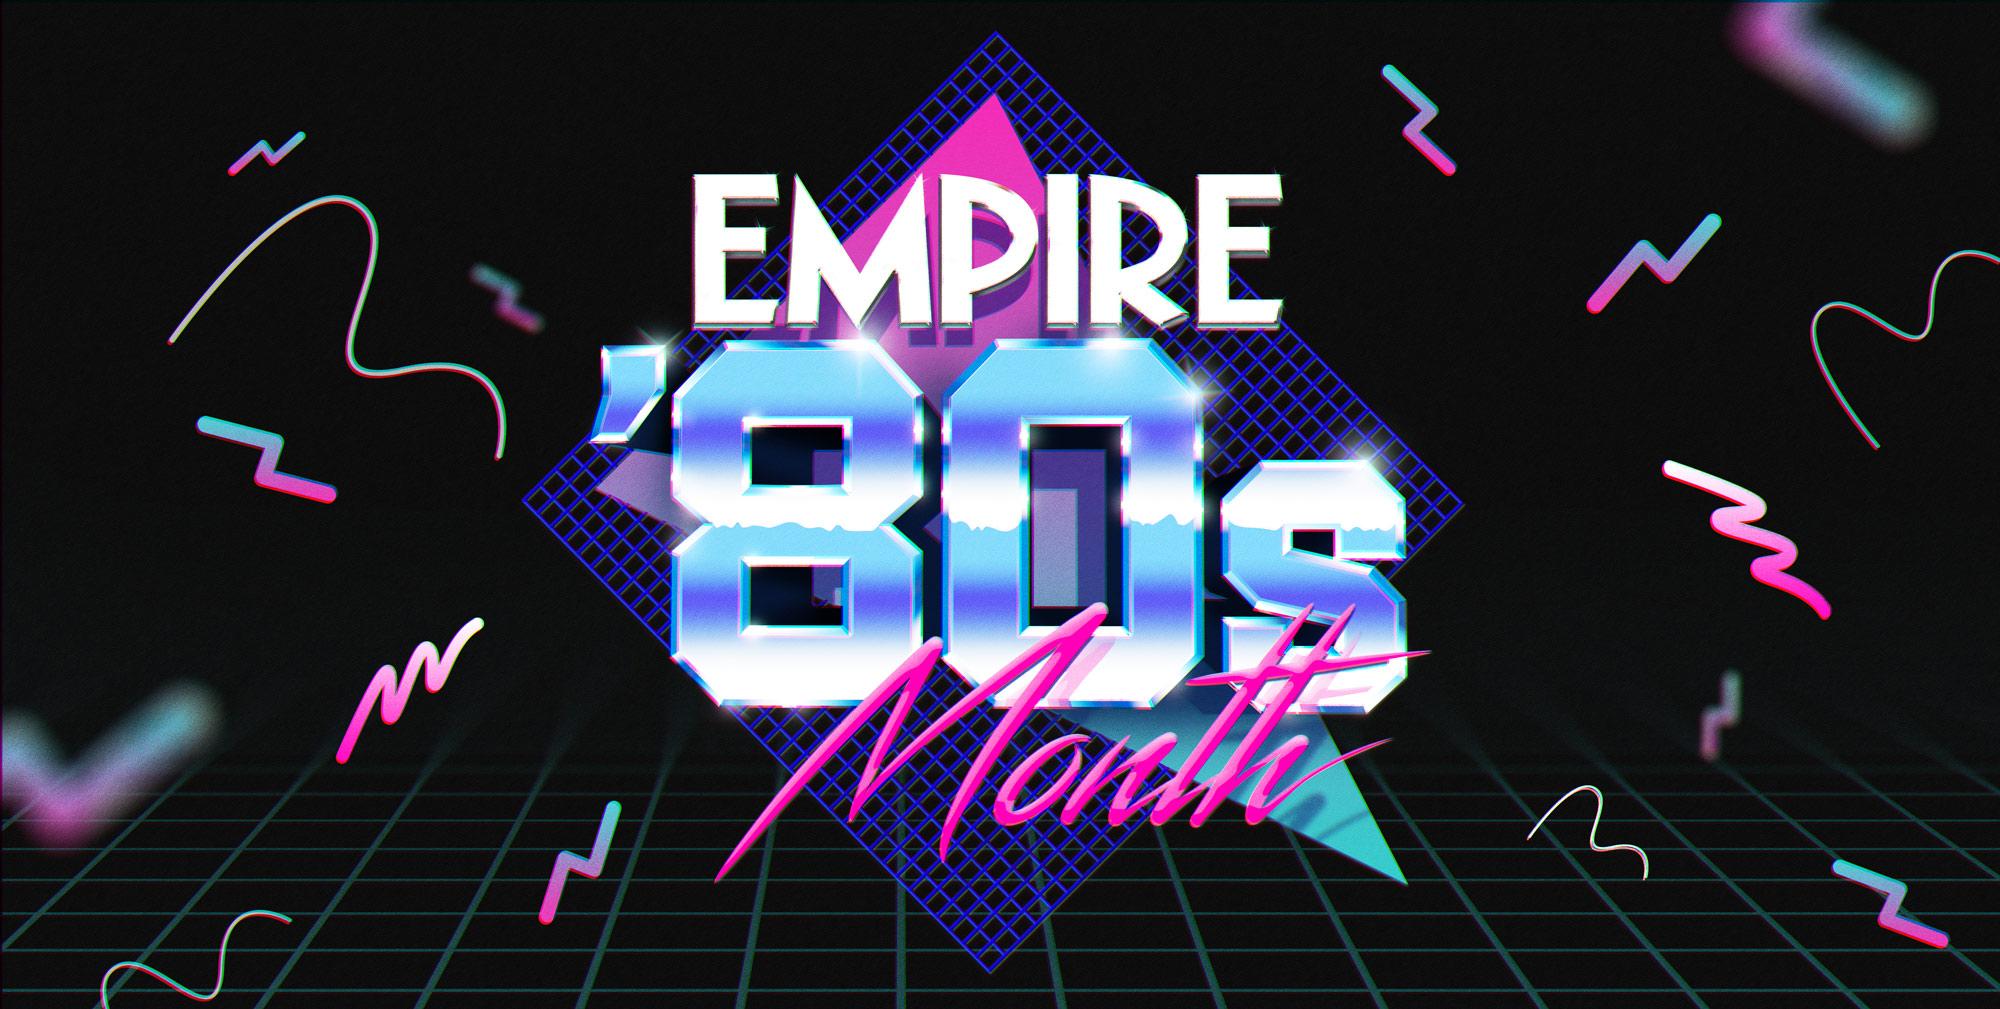 80's-Empire-Banner-VHS-Distorted.jpg